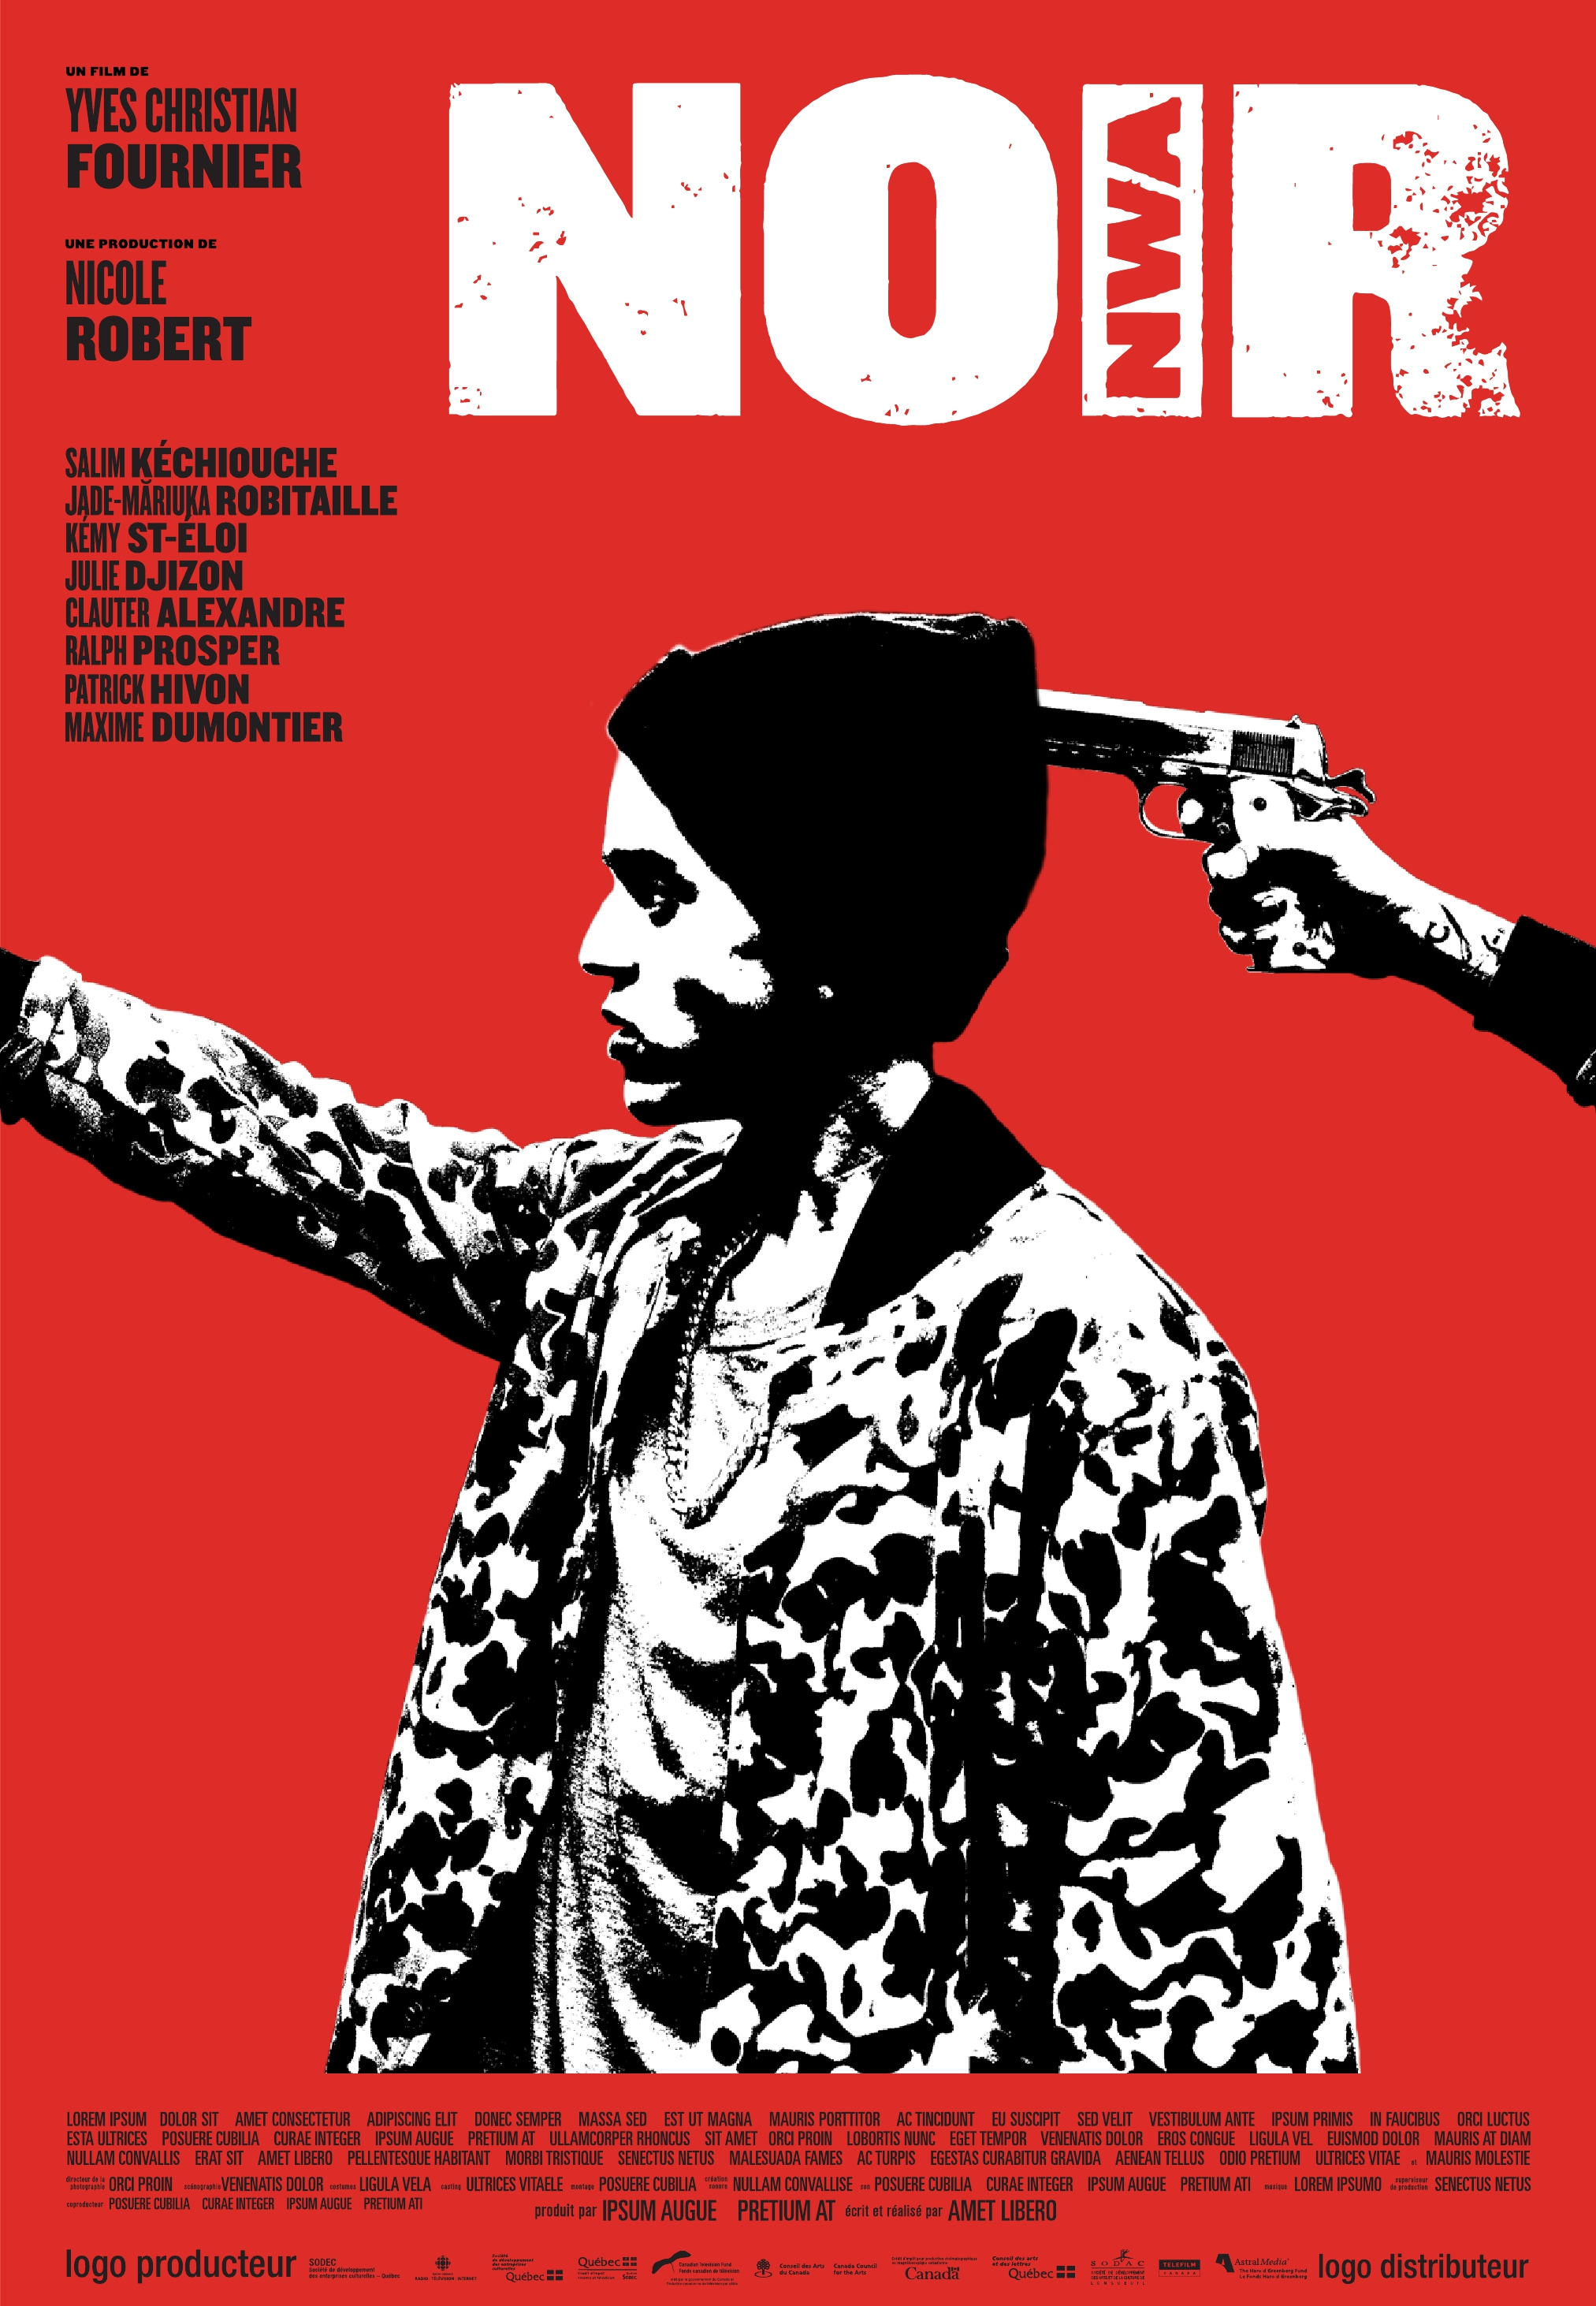 NOIR-Poster-RENZO-13oct-1_00007.jpg